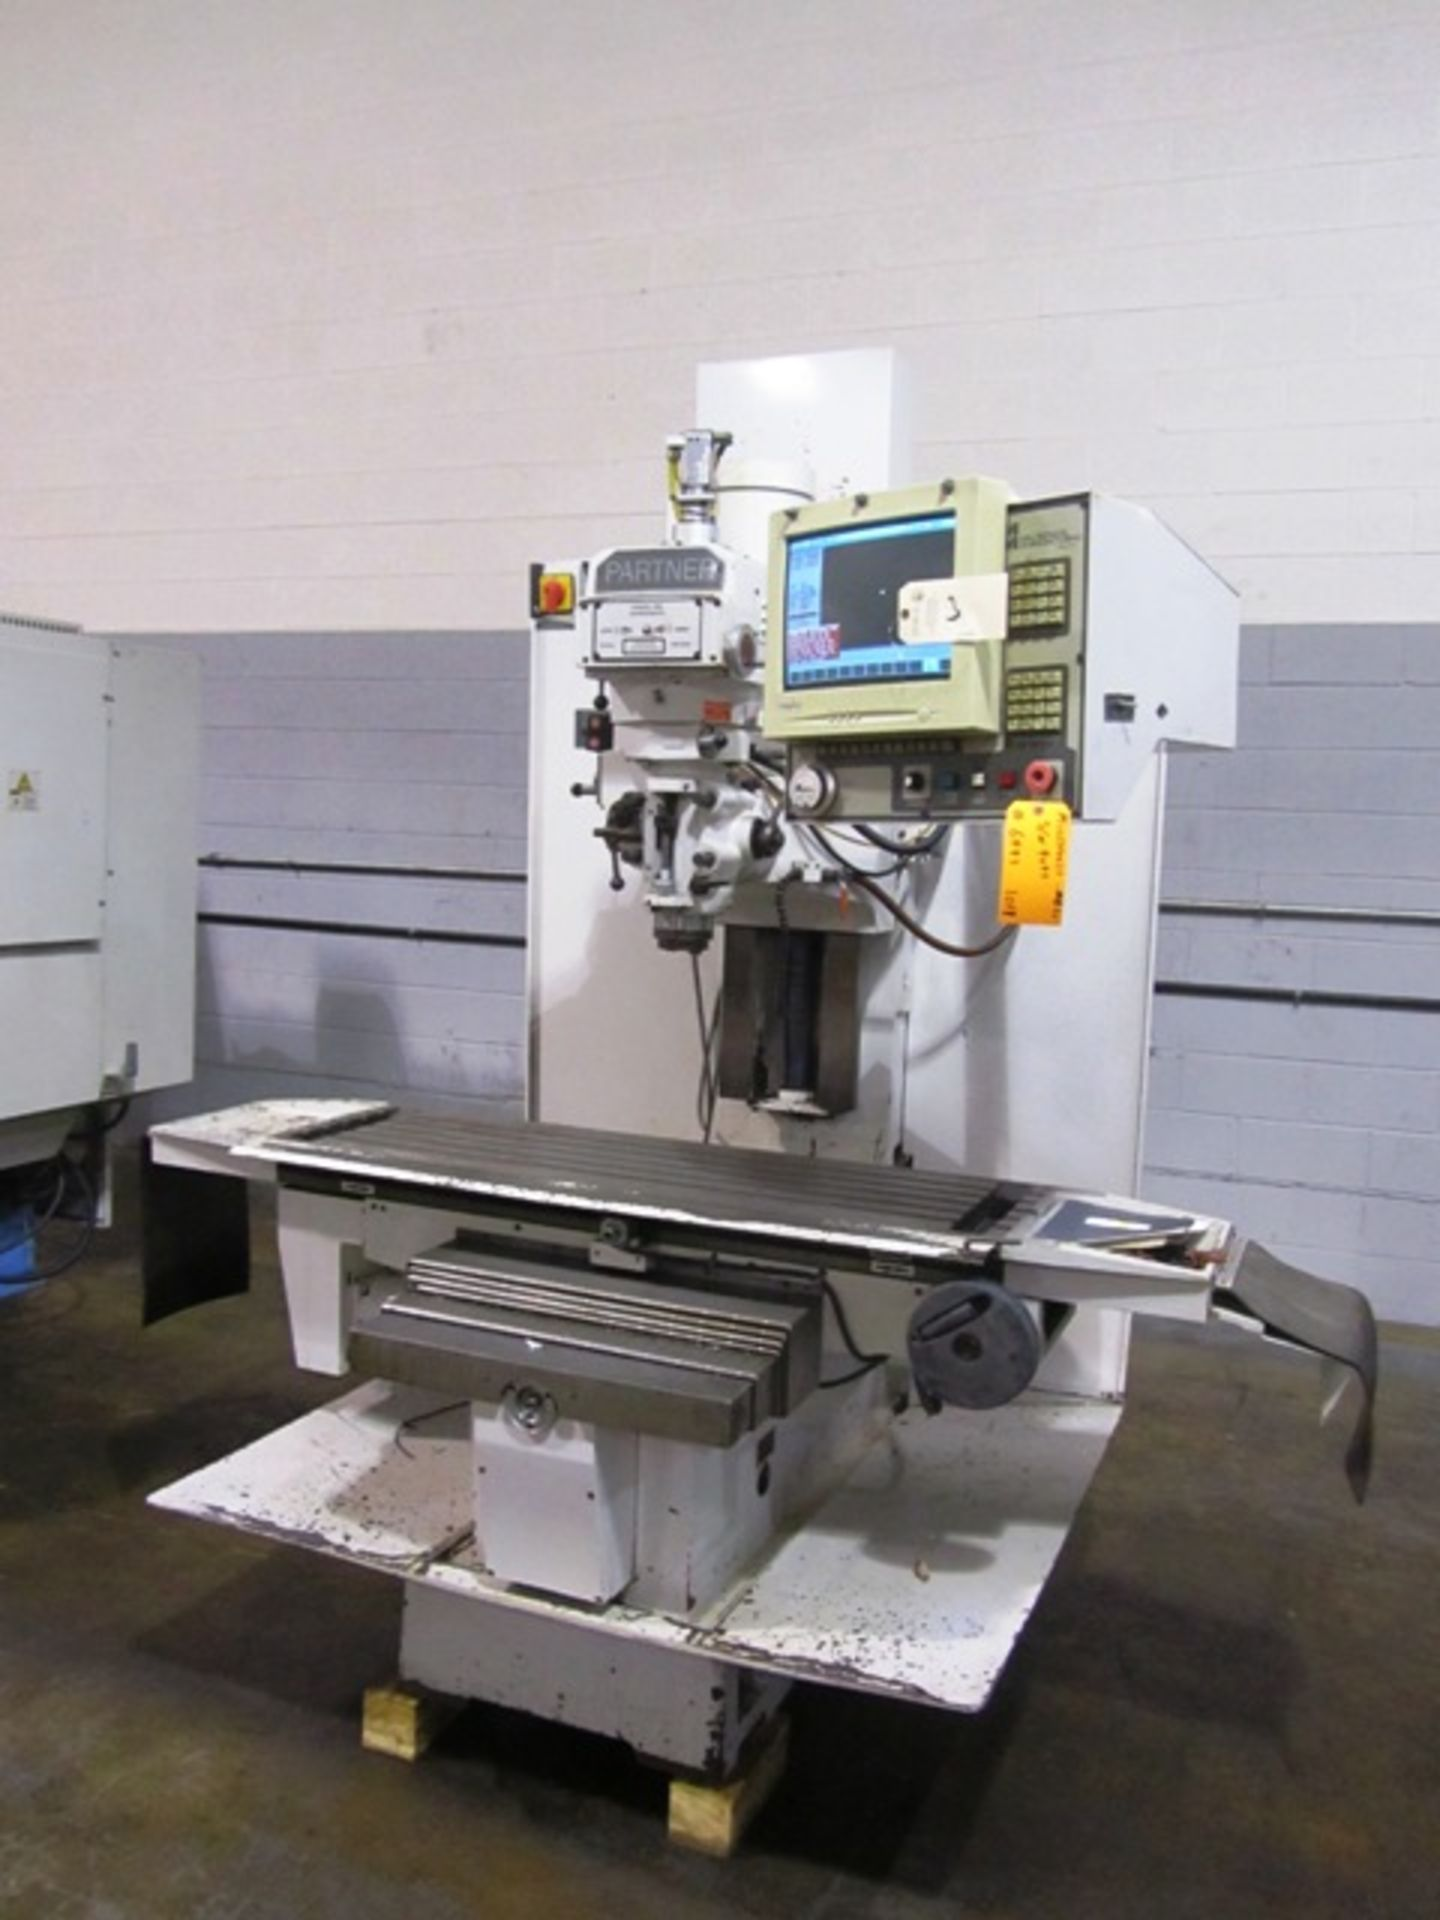 Lot 3 - Milltronics Partner Model MB 20 3-Axis CNC Milling Machine